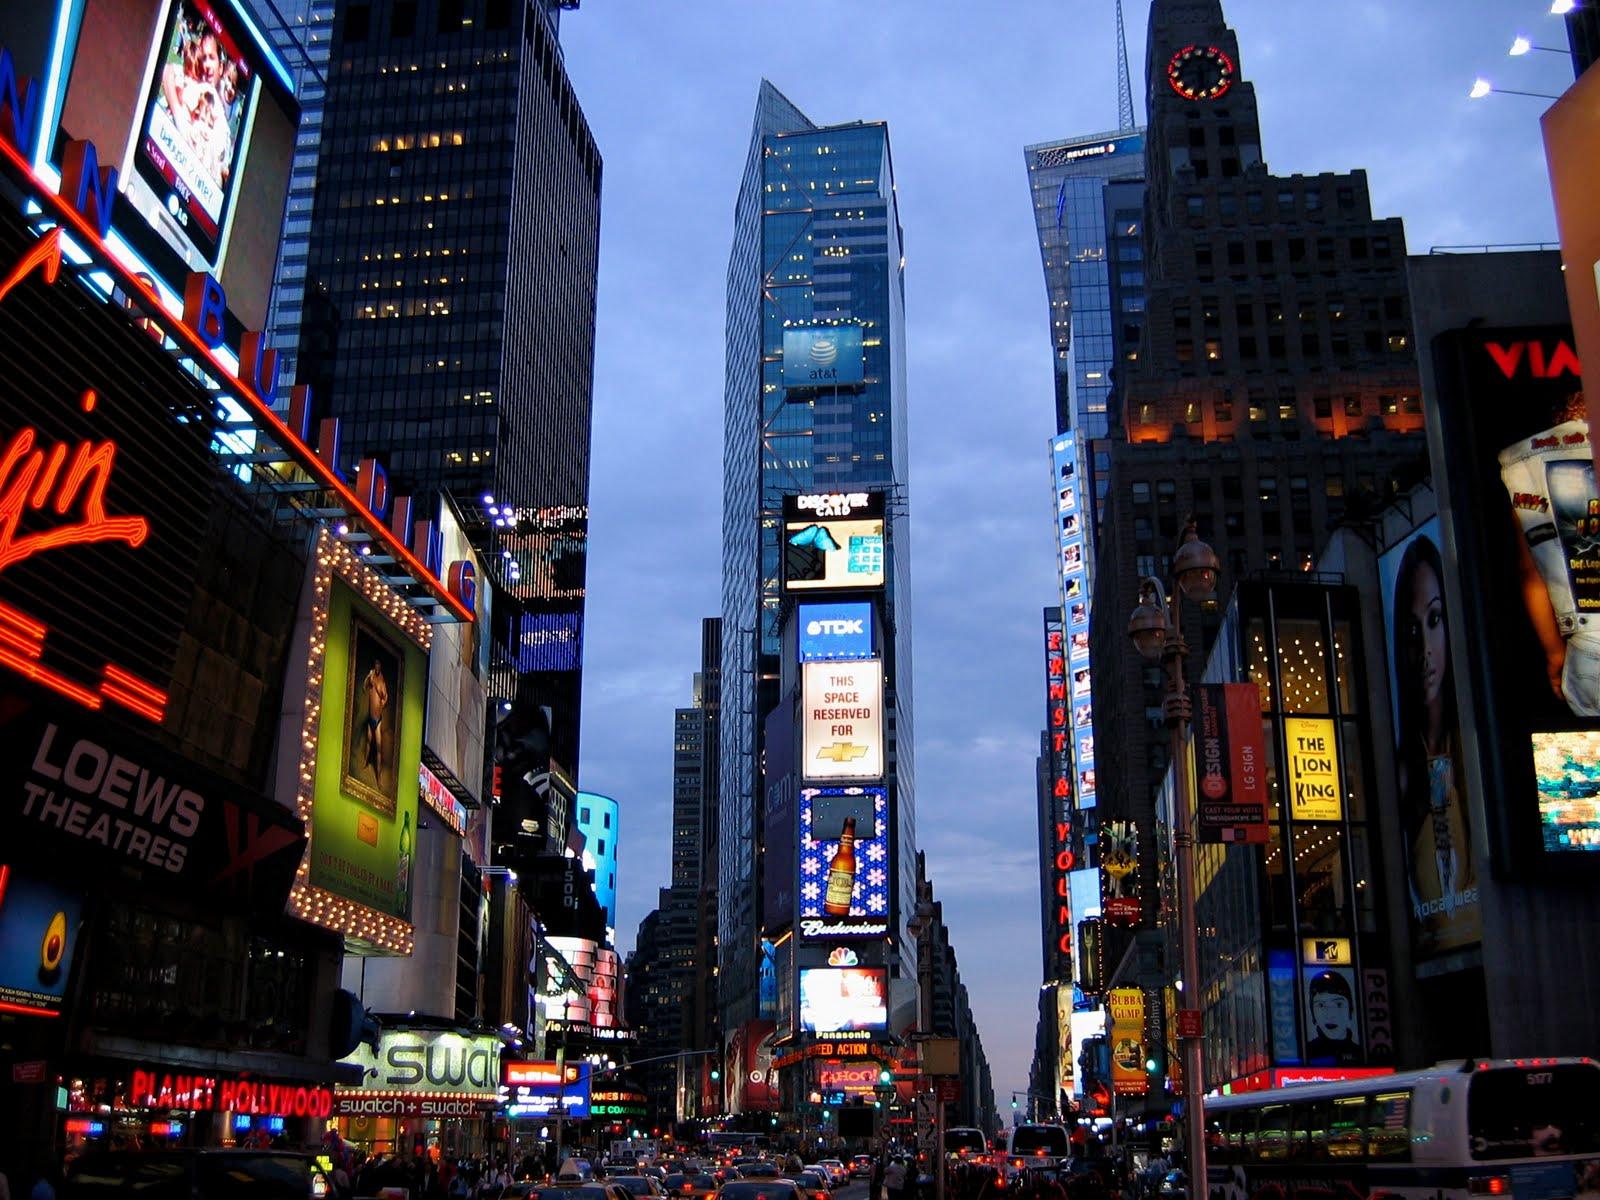 http://1.bp.blogspot.com/_OJsWo9ijhWY/S67fEsqWwvI/AAAAAAAAAF8/-FMg11rG3vo/s1600/times_square_new_york_at_dusk.jpg